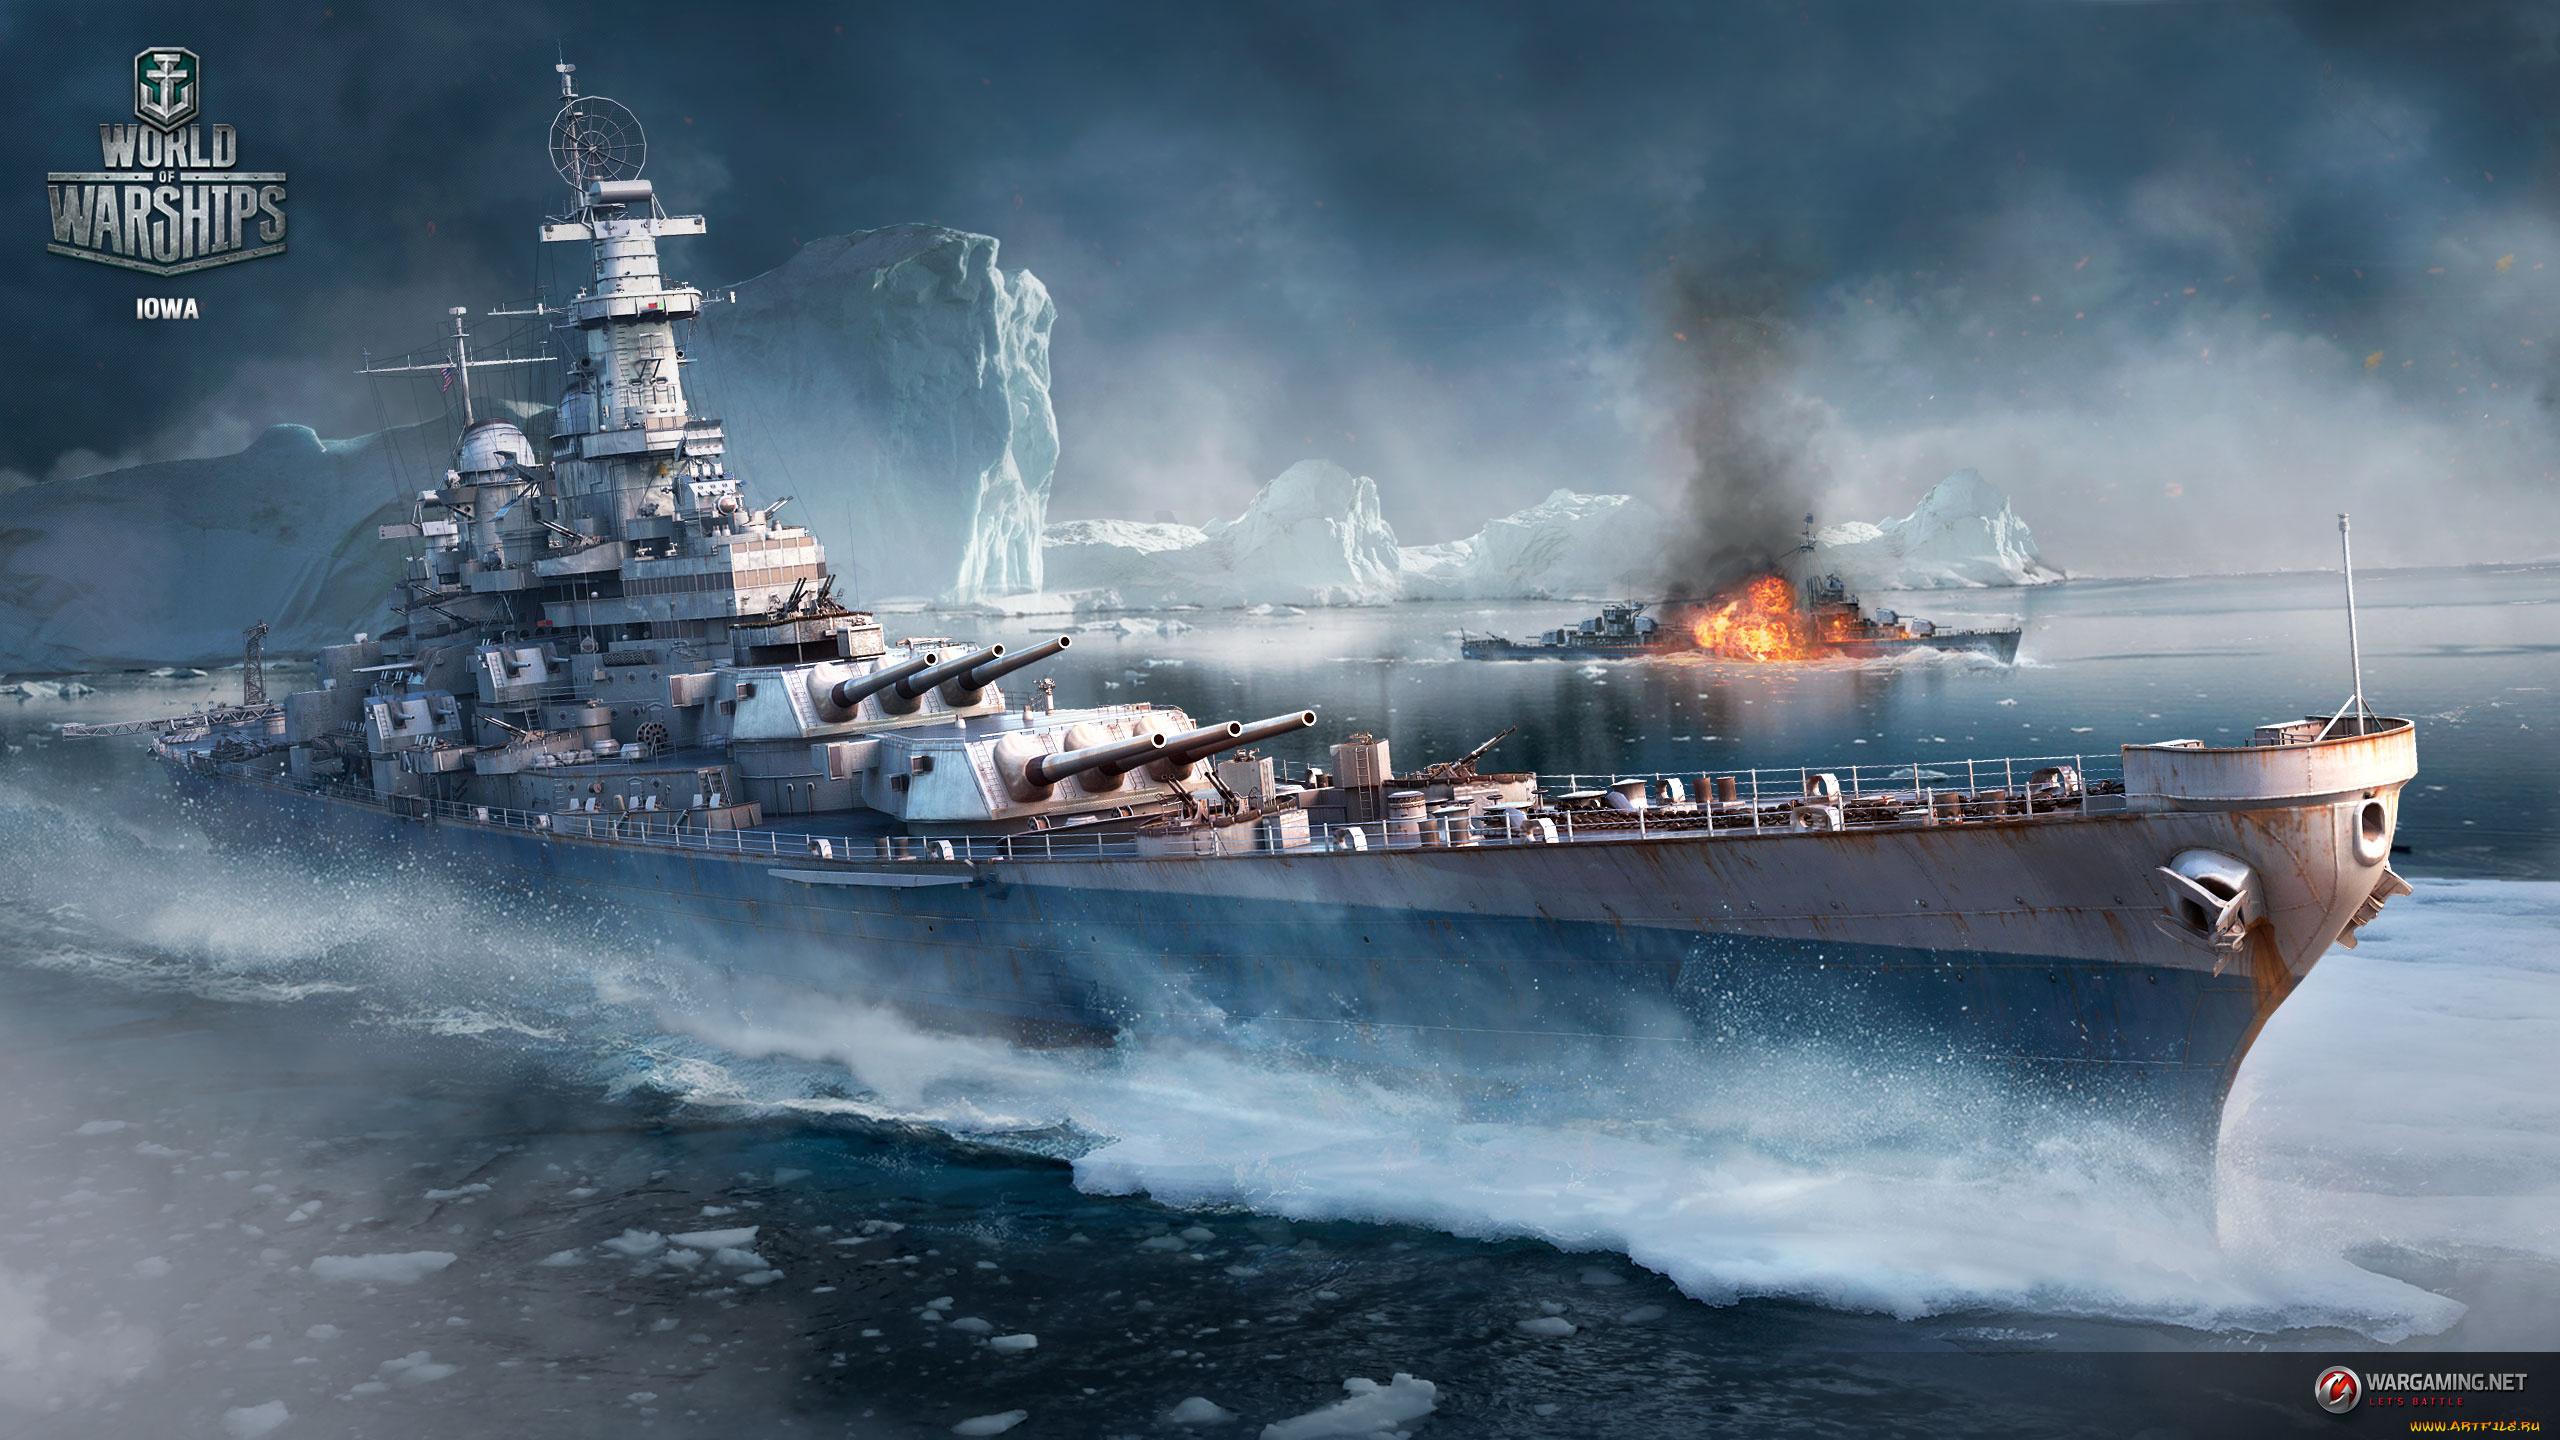 Обои на рабочий стол 1920х1080 корабли world of warships